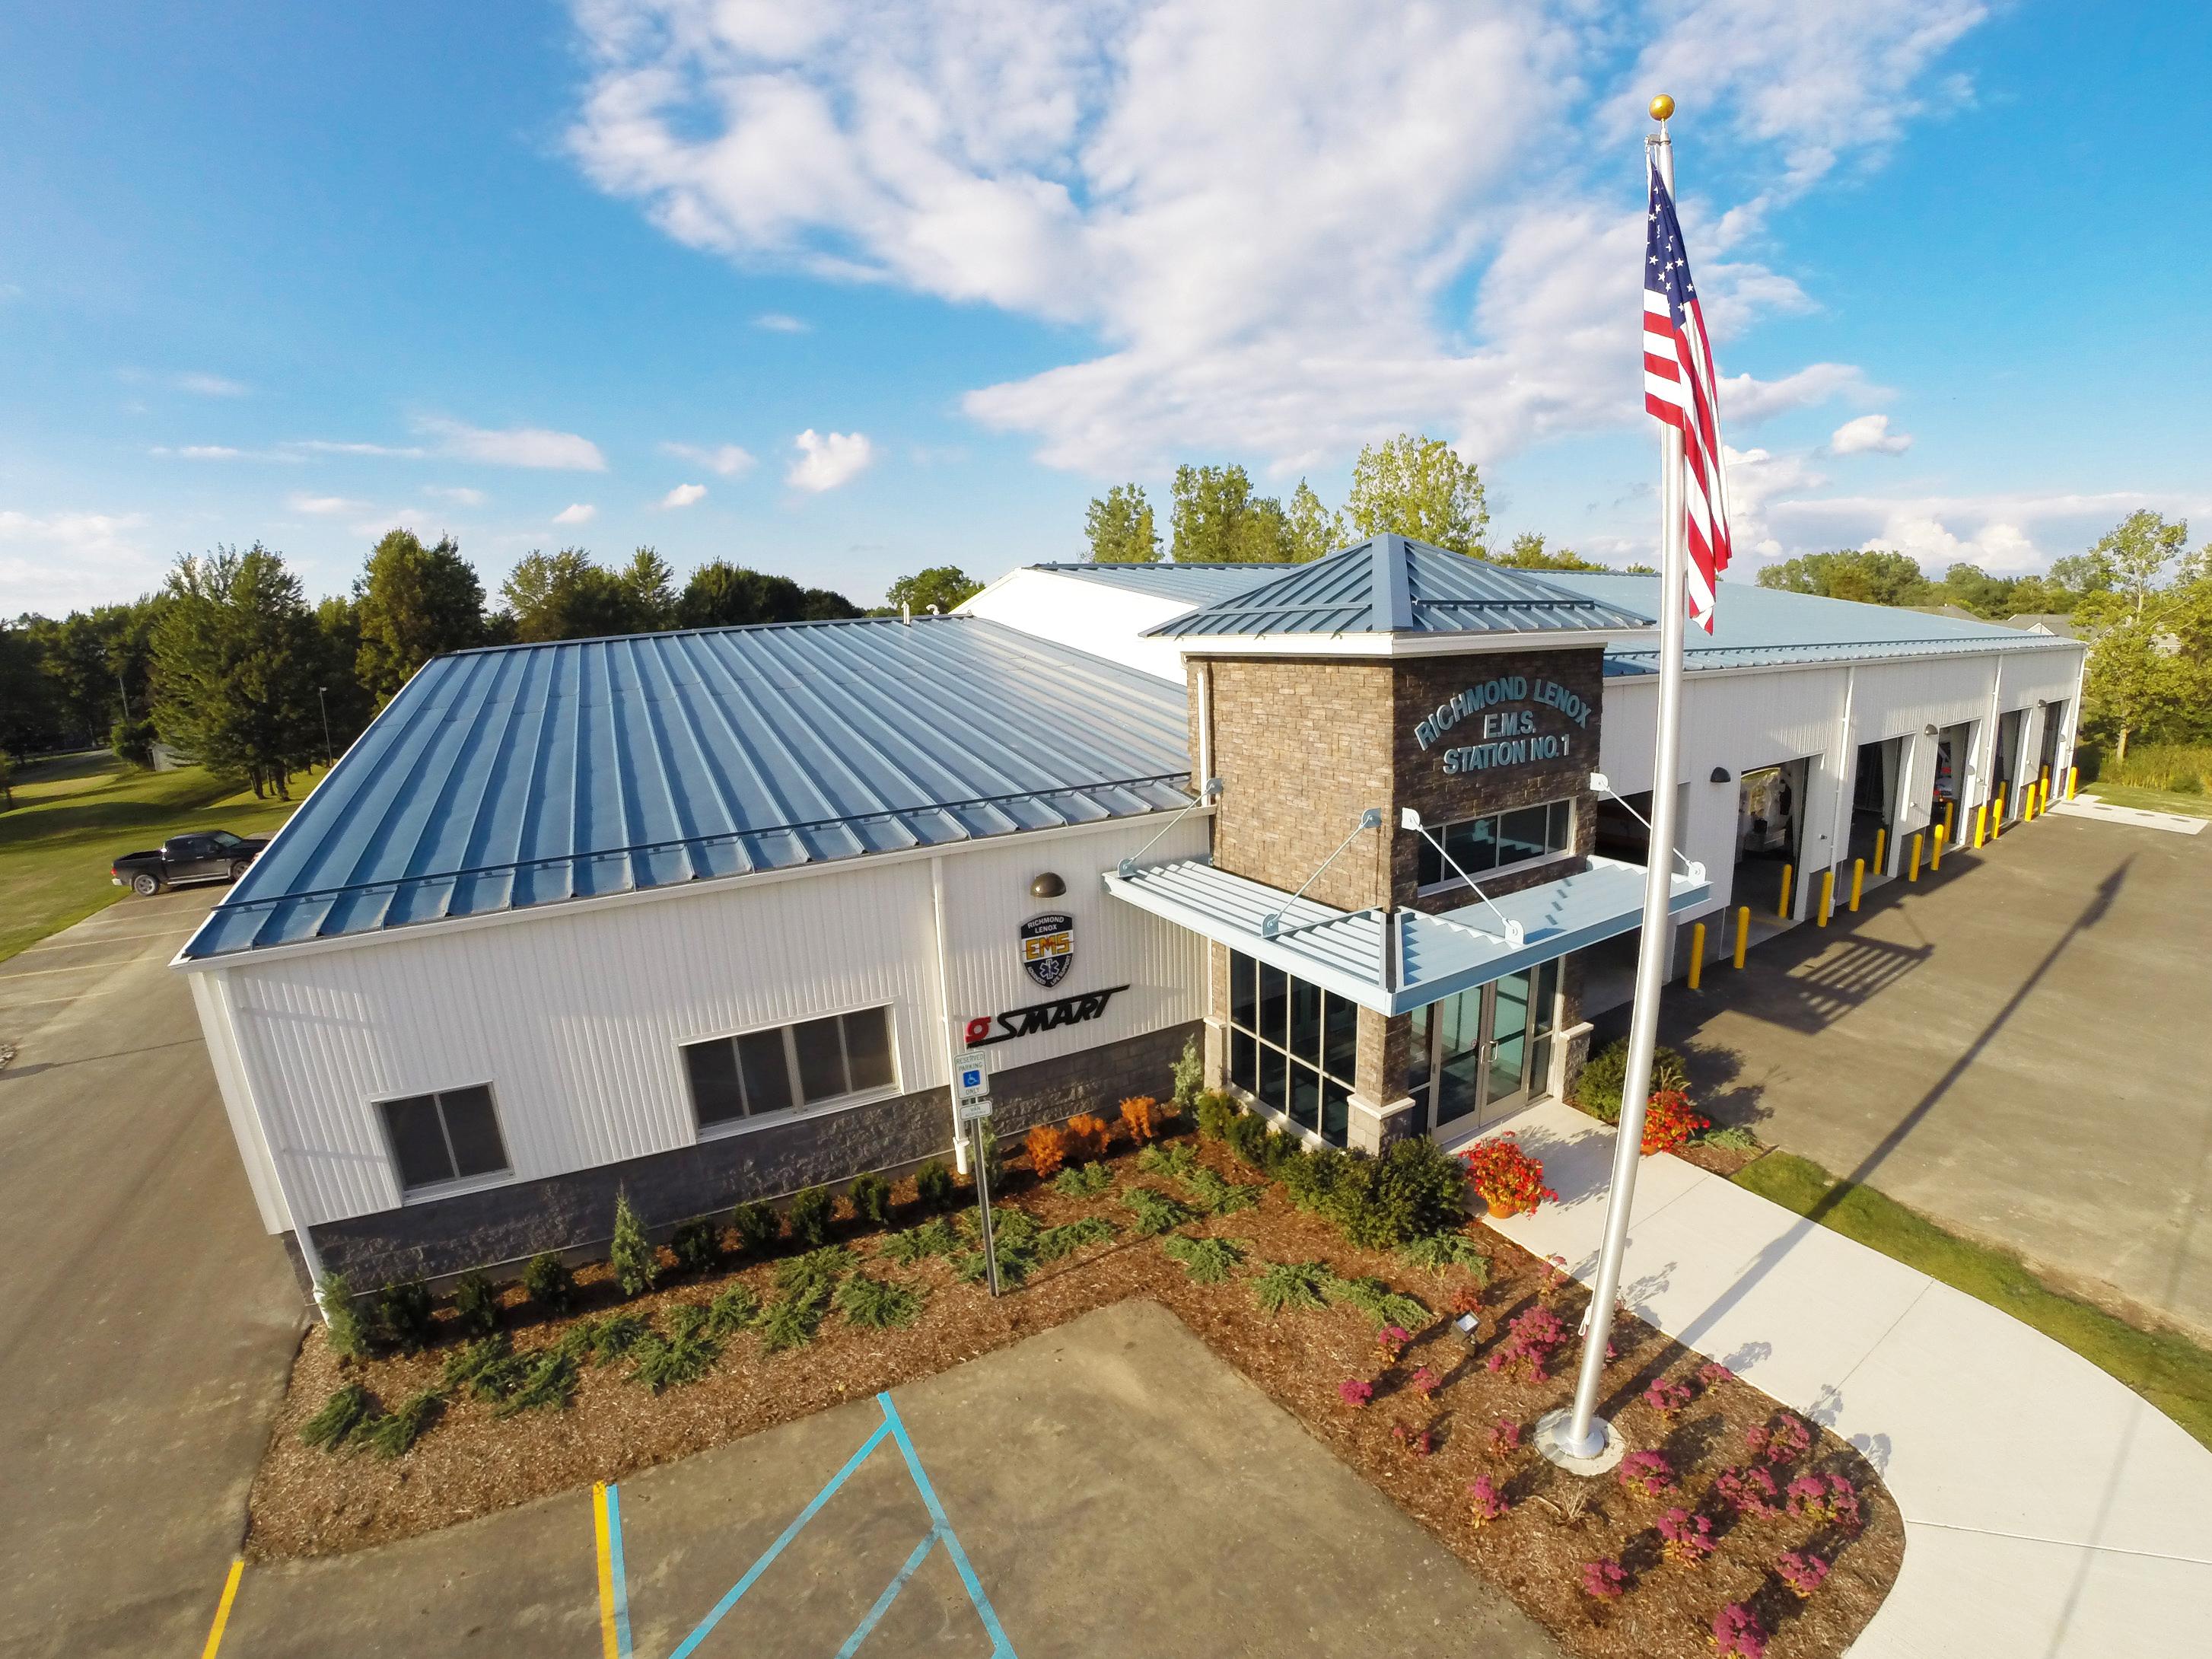 Richmond Lenox EMS/SMART Facility.